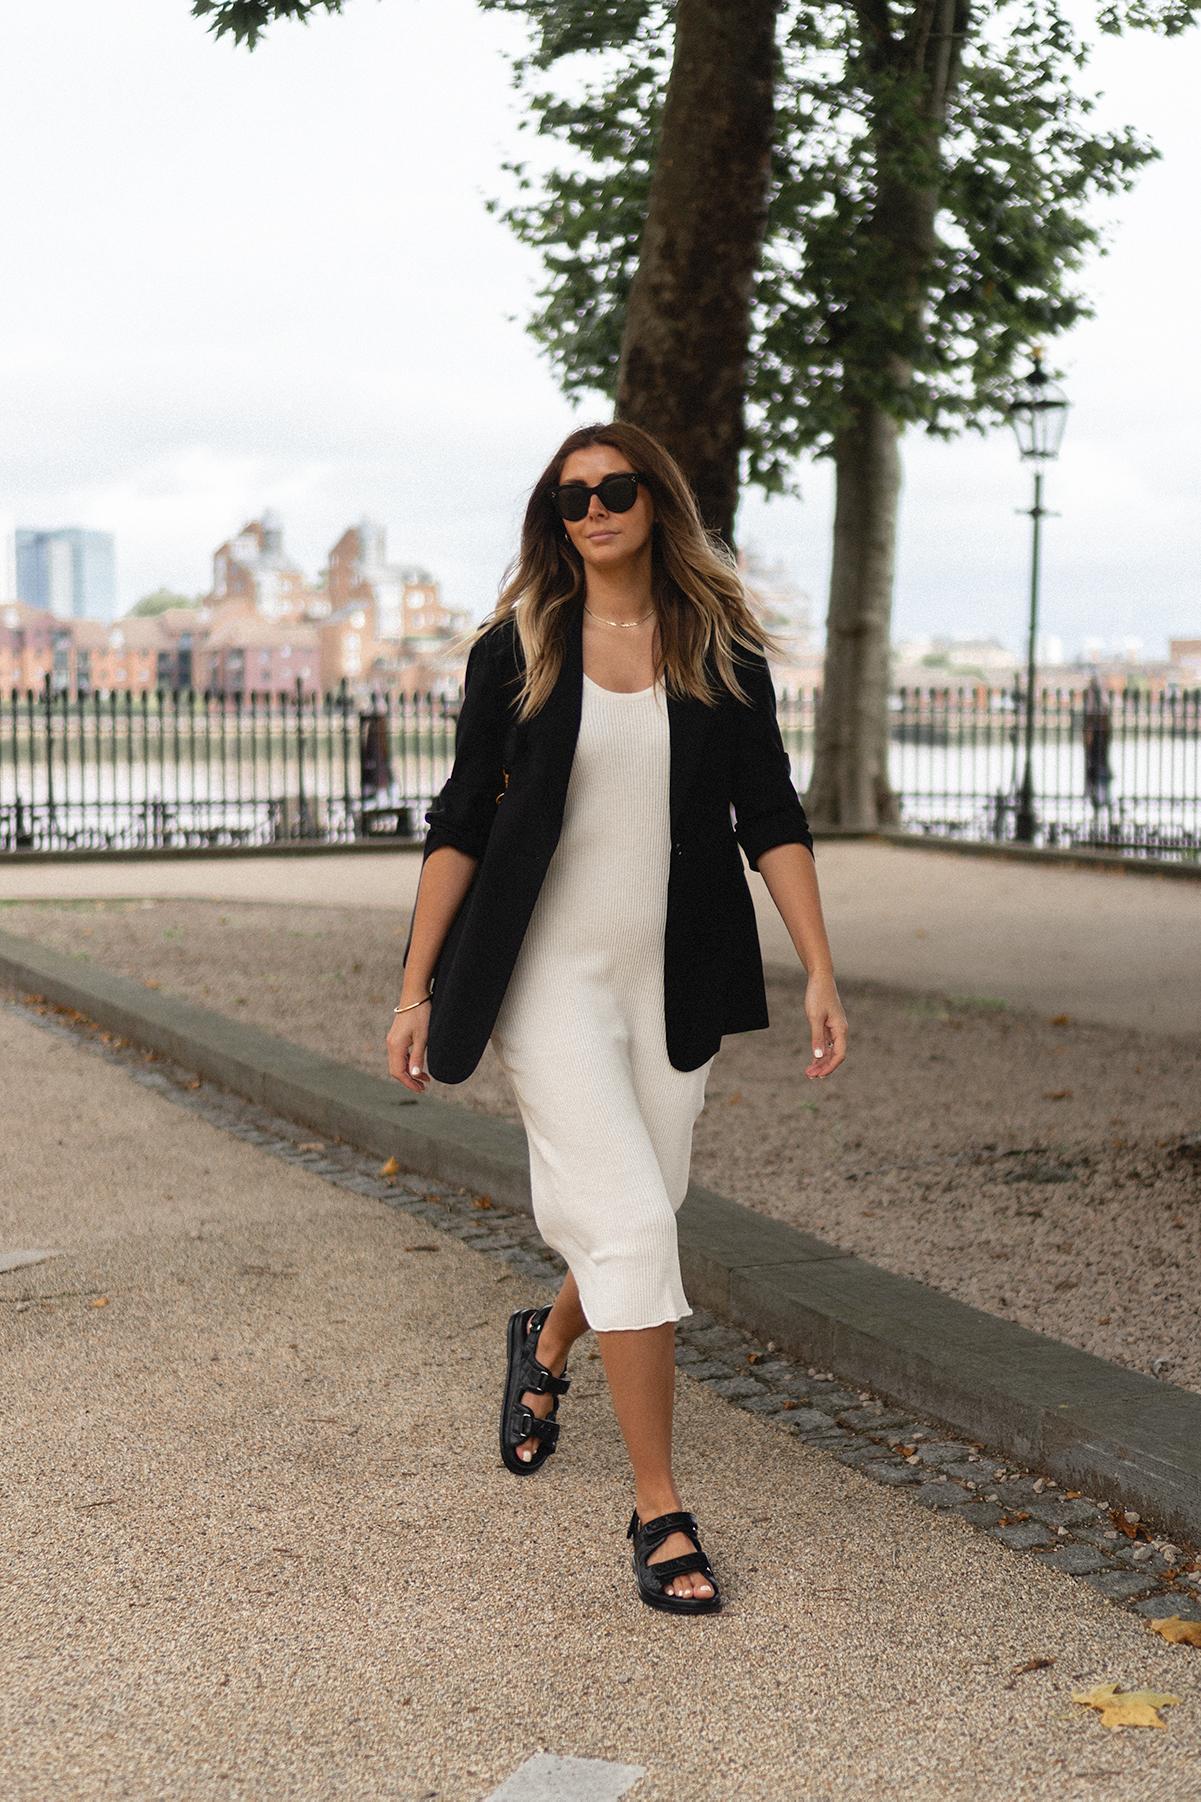 Emma Hill wears cream ribbed midi dress, black classic blazer, Chanel dad sandals, Celine black Seau Sangle bag, Celine Baby Audrey sunglasses. Chic Spring Summer outfit